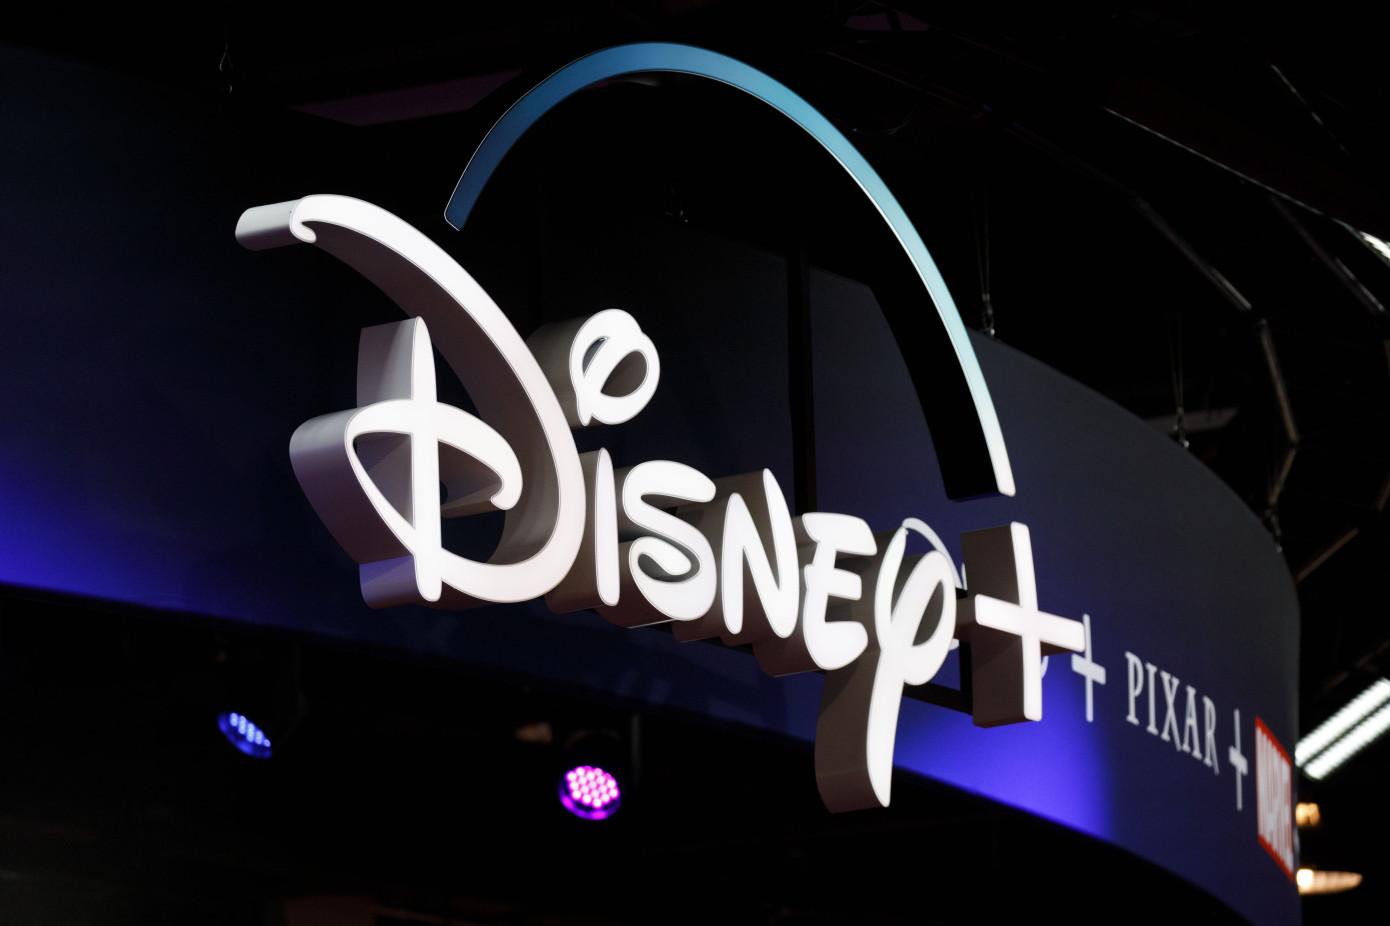 Disney+ launch postponed due to coronavirus outbreak